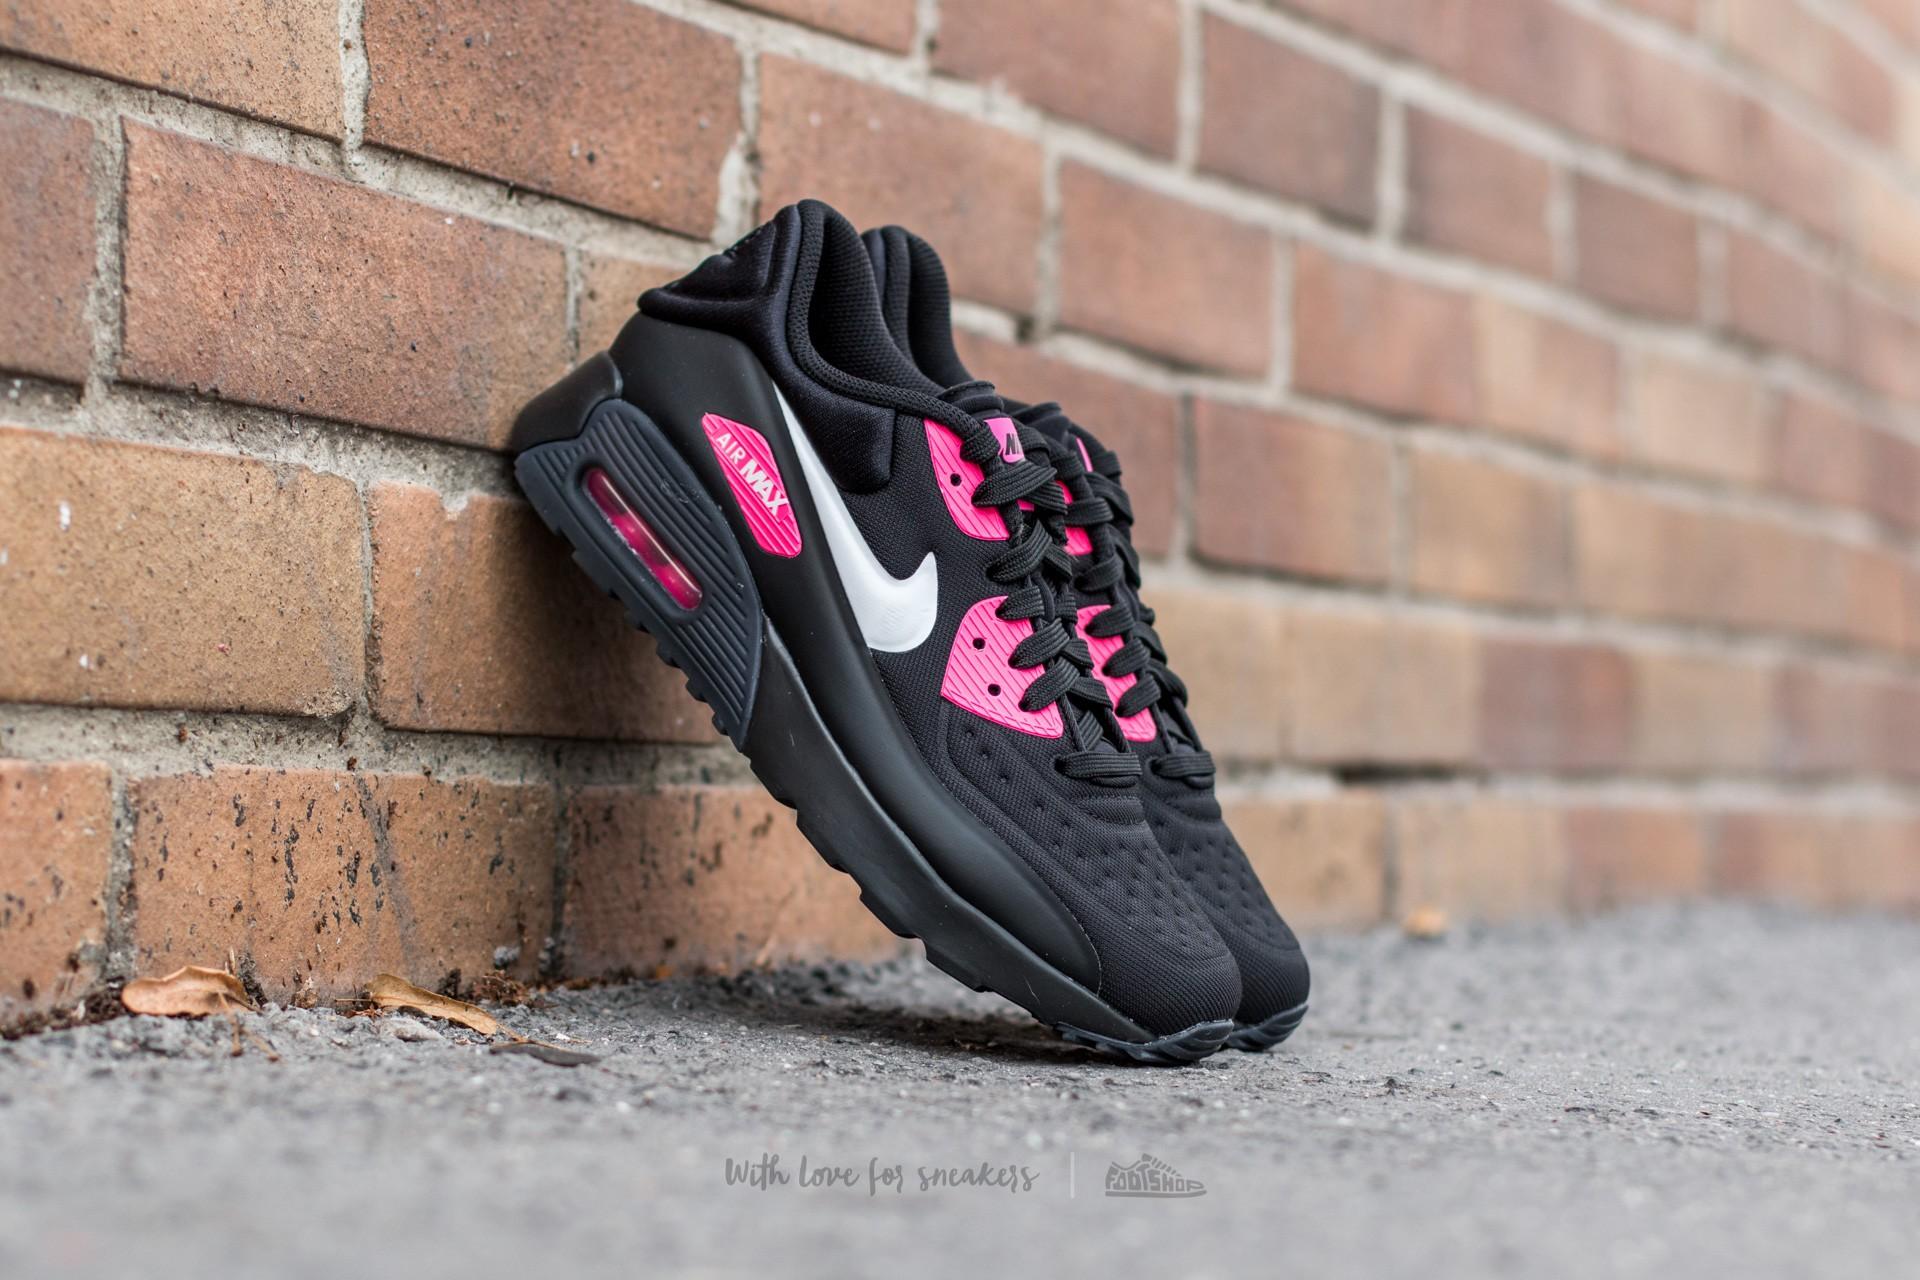 nike air max 90 black and pink